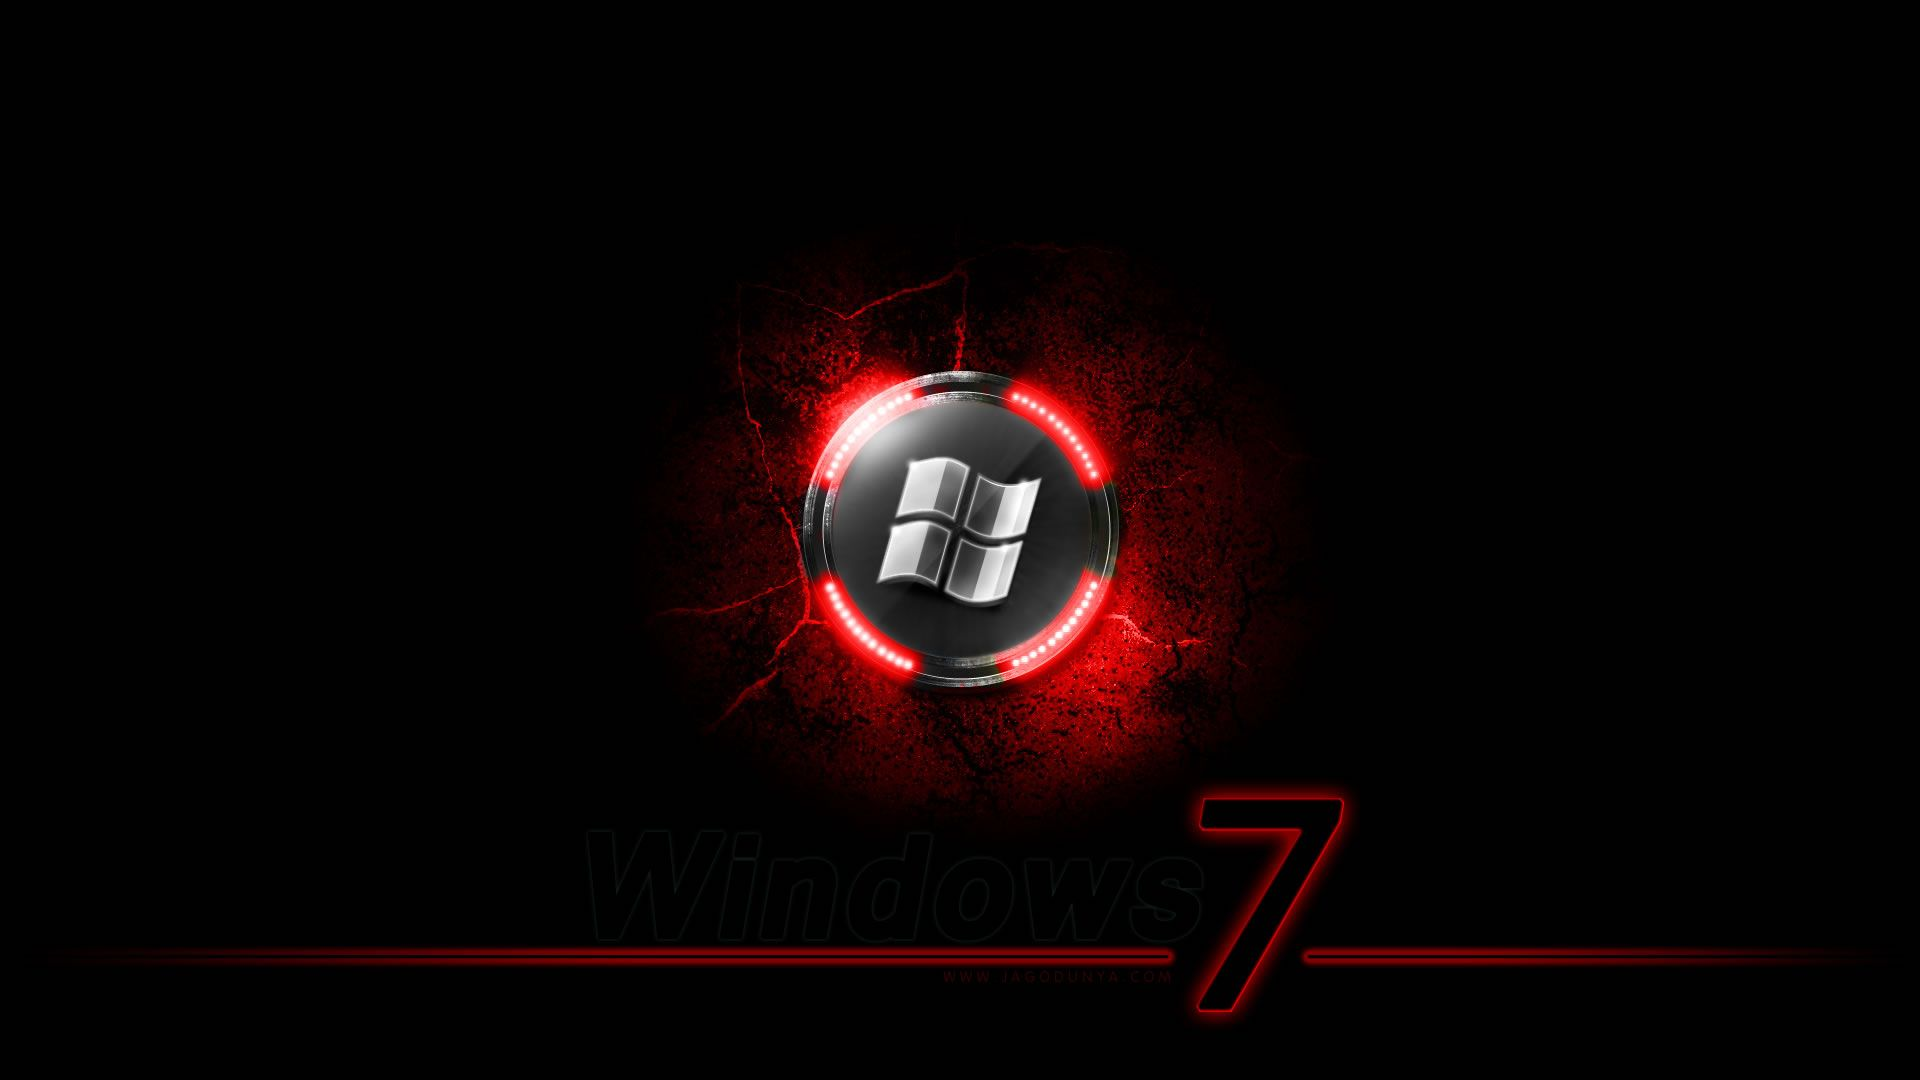 Hd wallpaper windows 7 - Full Hd Wallpapers Windows 7 Red And Black Pinterest Wallpaper And Hd Wallpaper